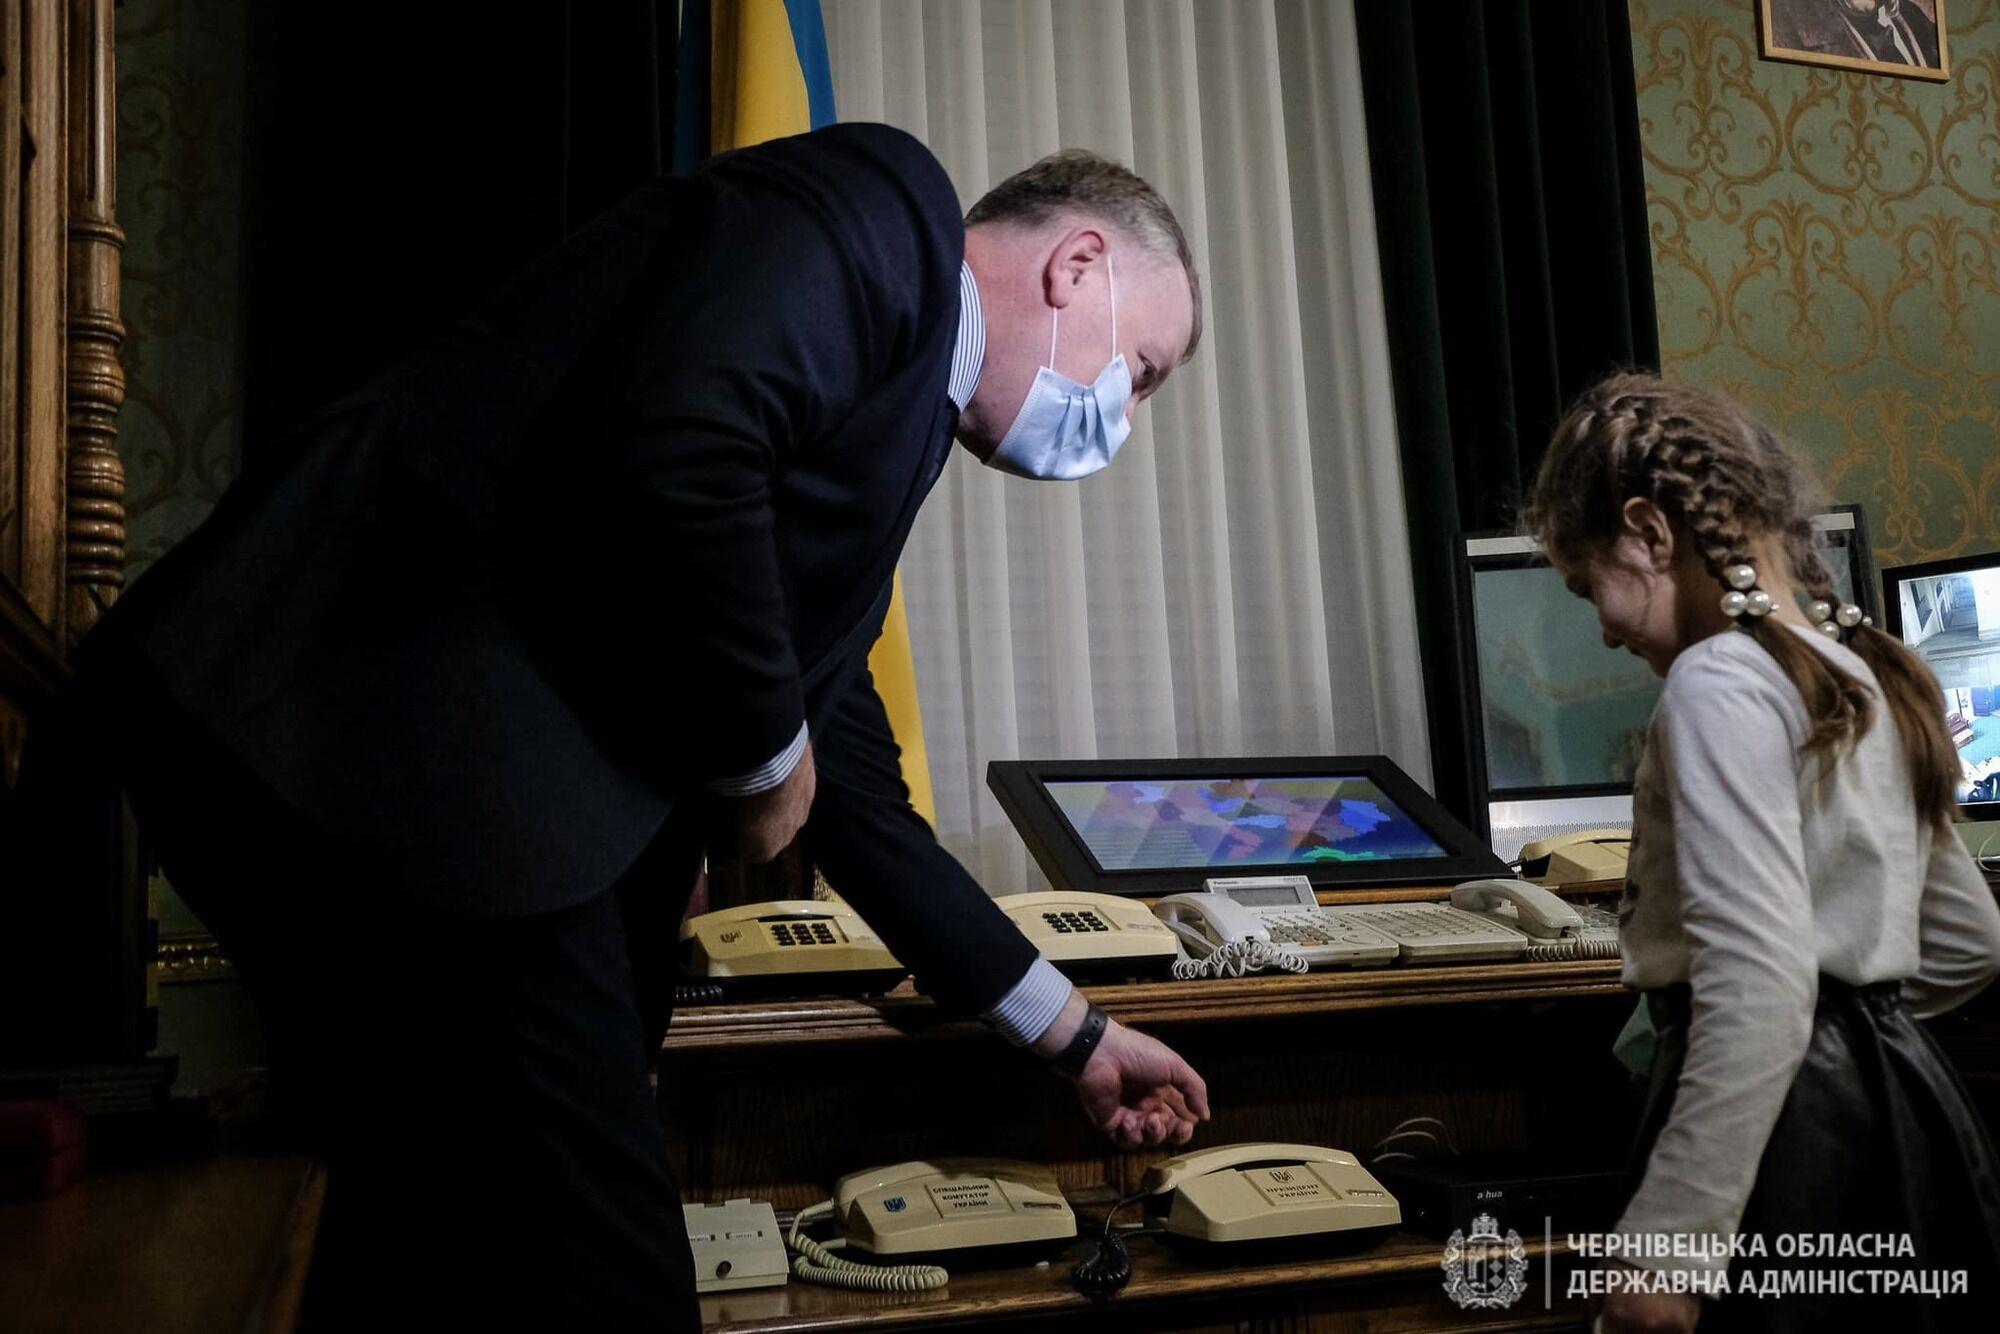 Маргариту от имени Зеленского поздравил Сергей Осачук.